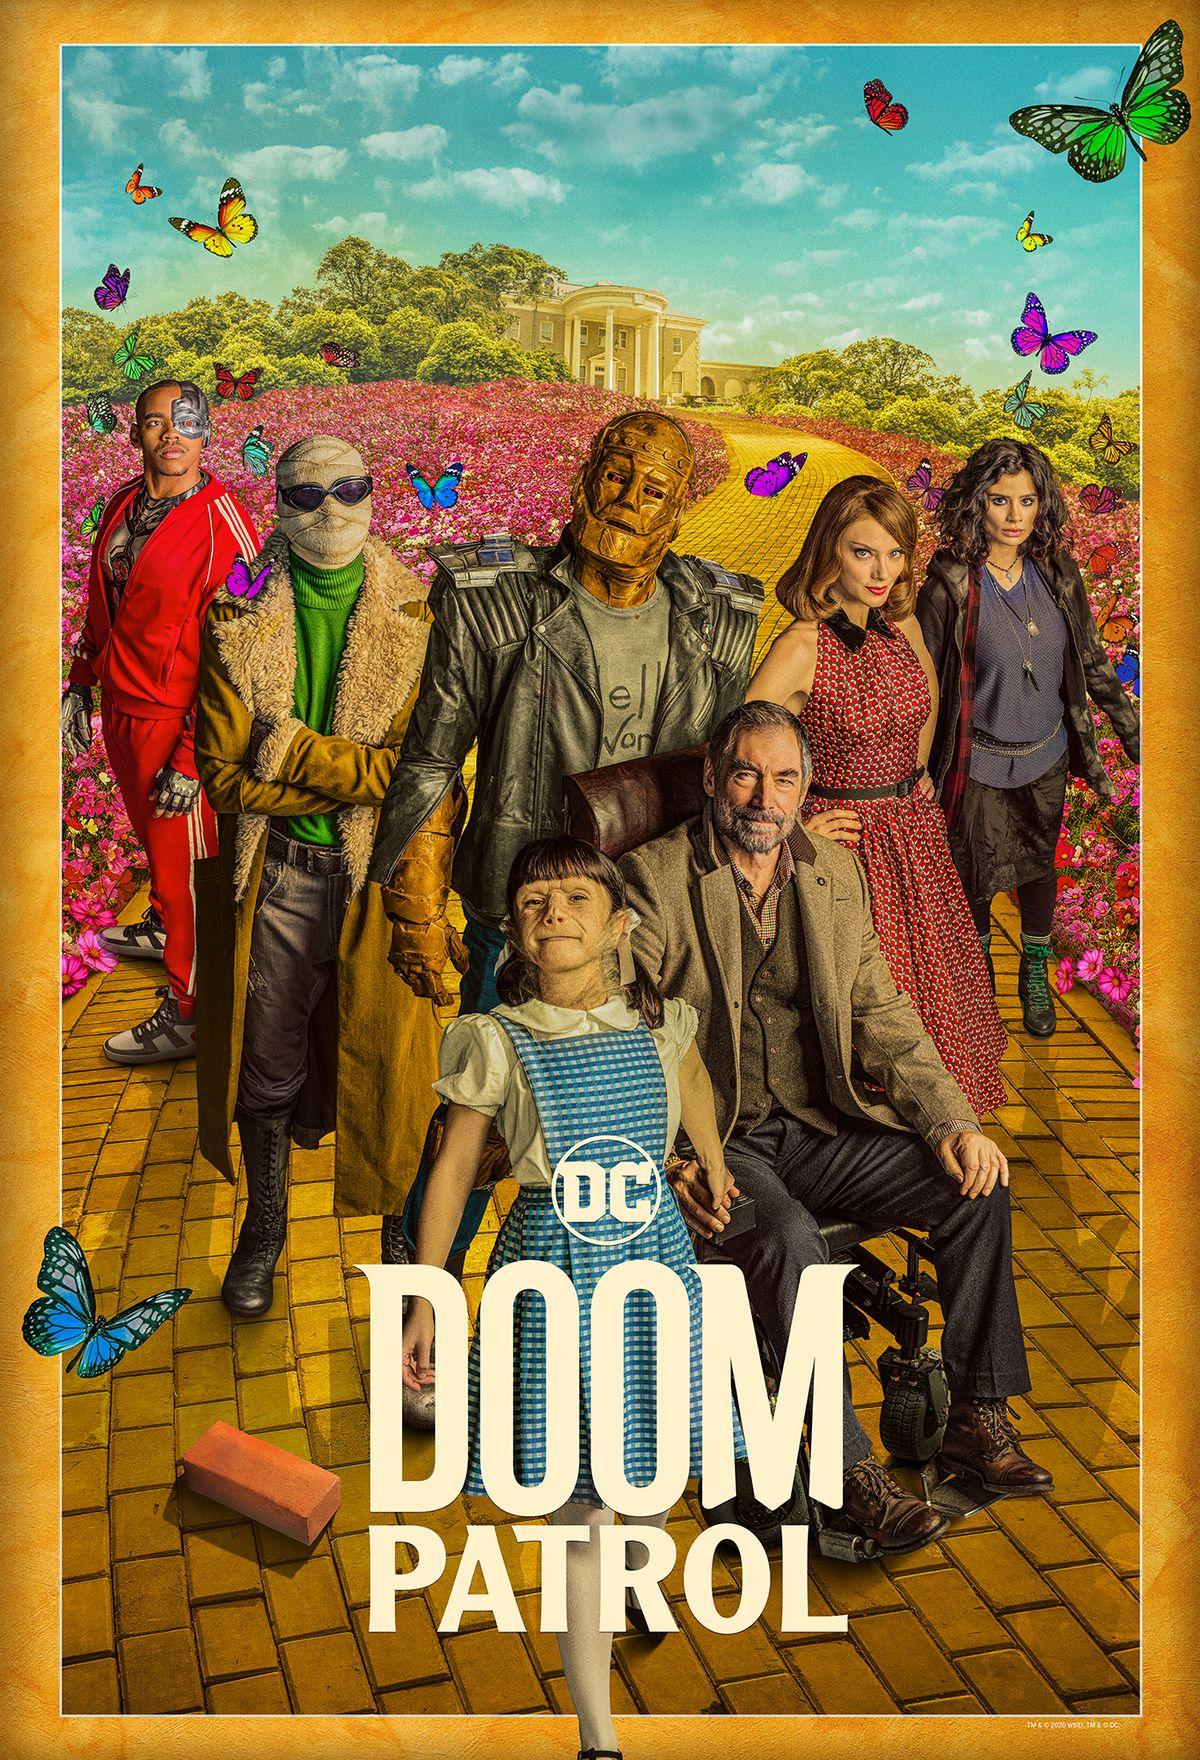 Cyborg, Negative Man, Robotman, Rita Farr, Crazy Jane, Danny the Brick, Dorothy Spinner, and the Chief on a poster for Doom Patrol season 2.